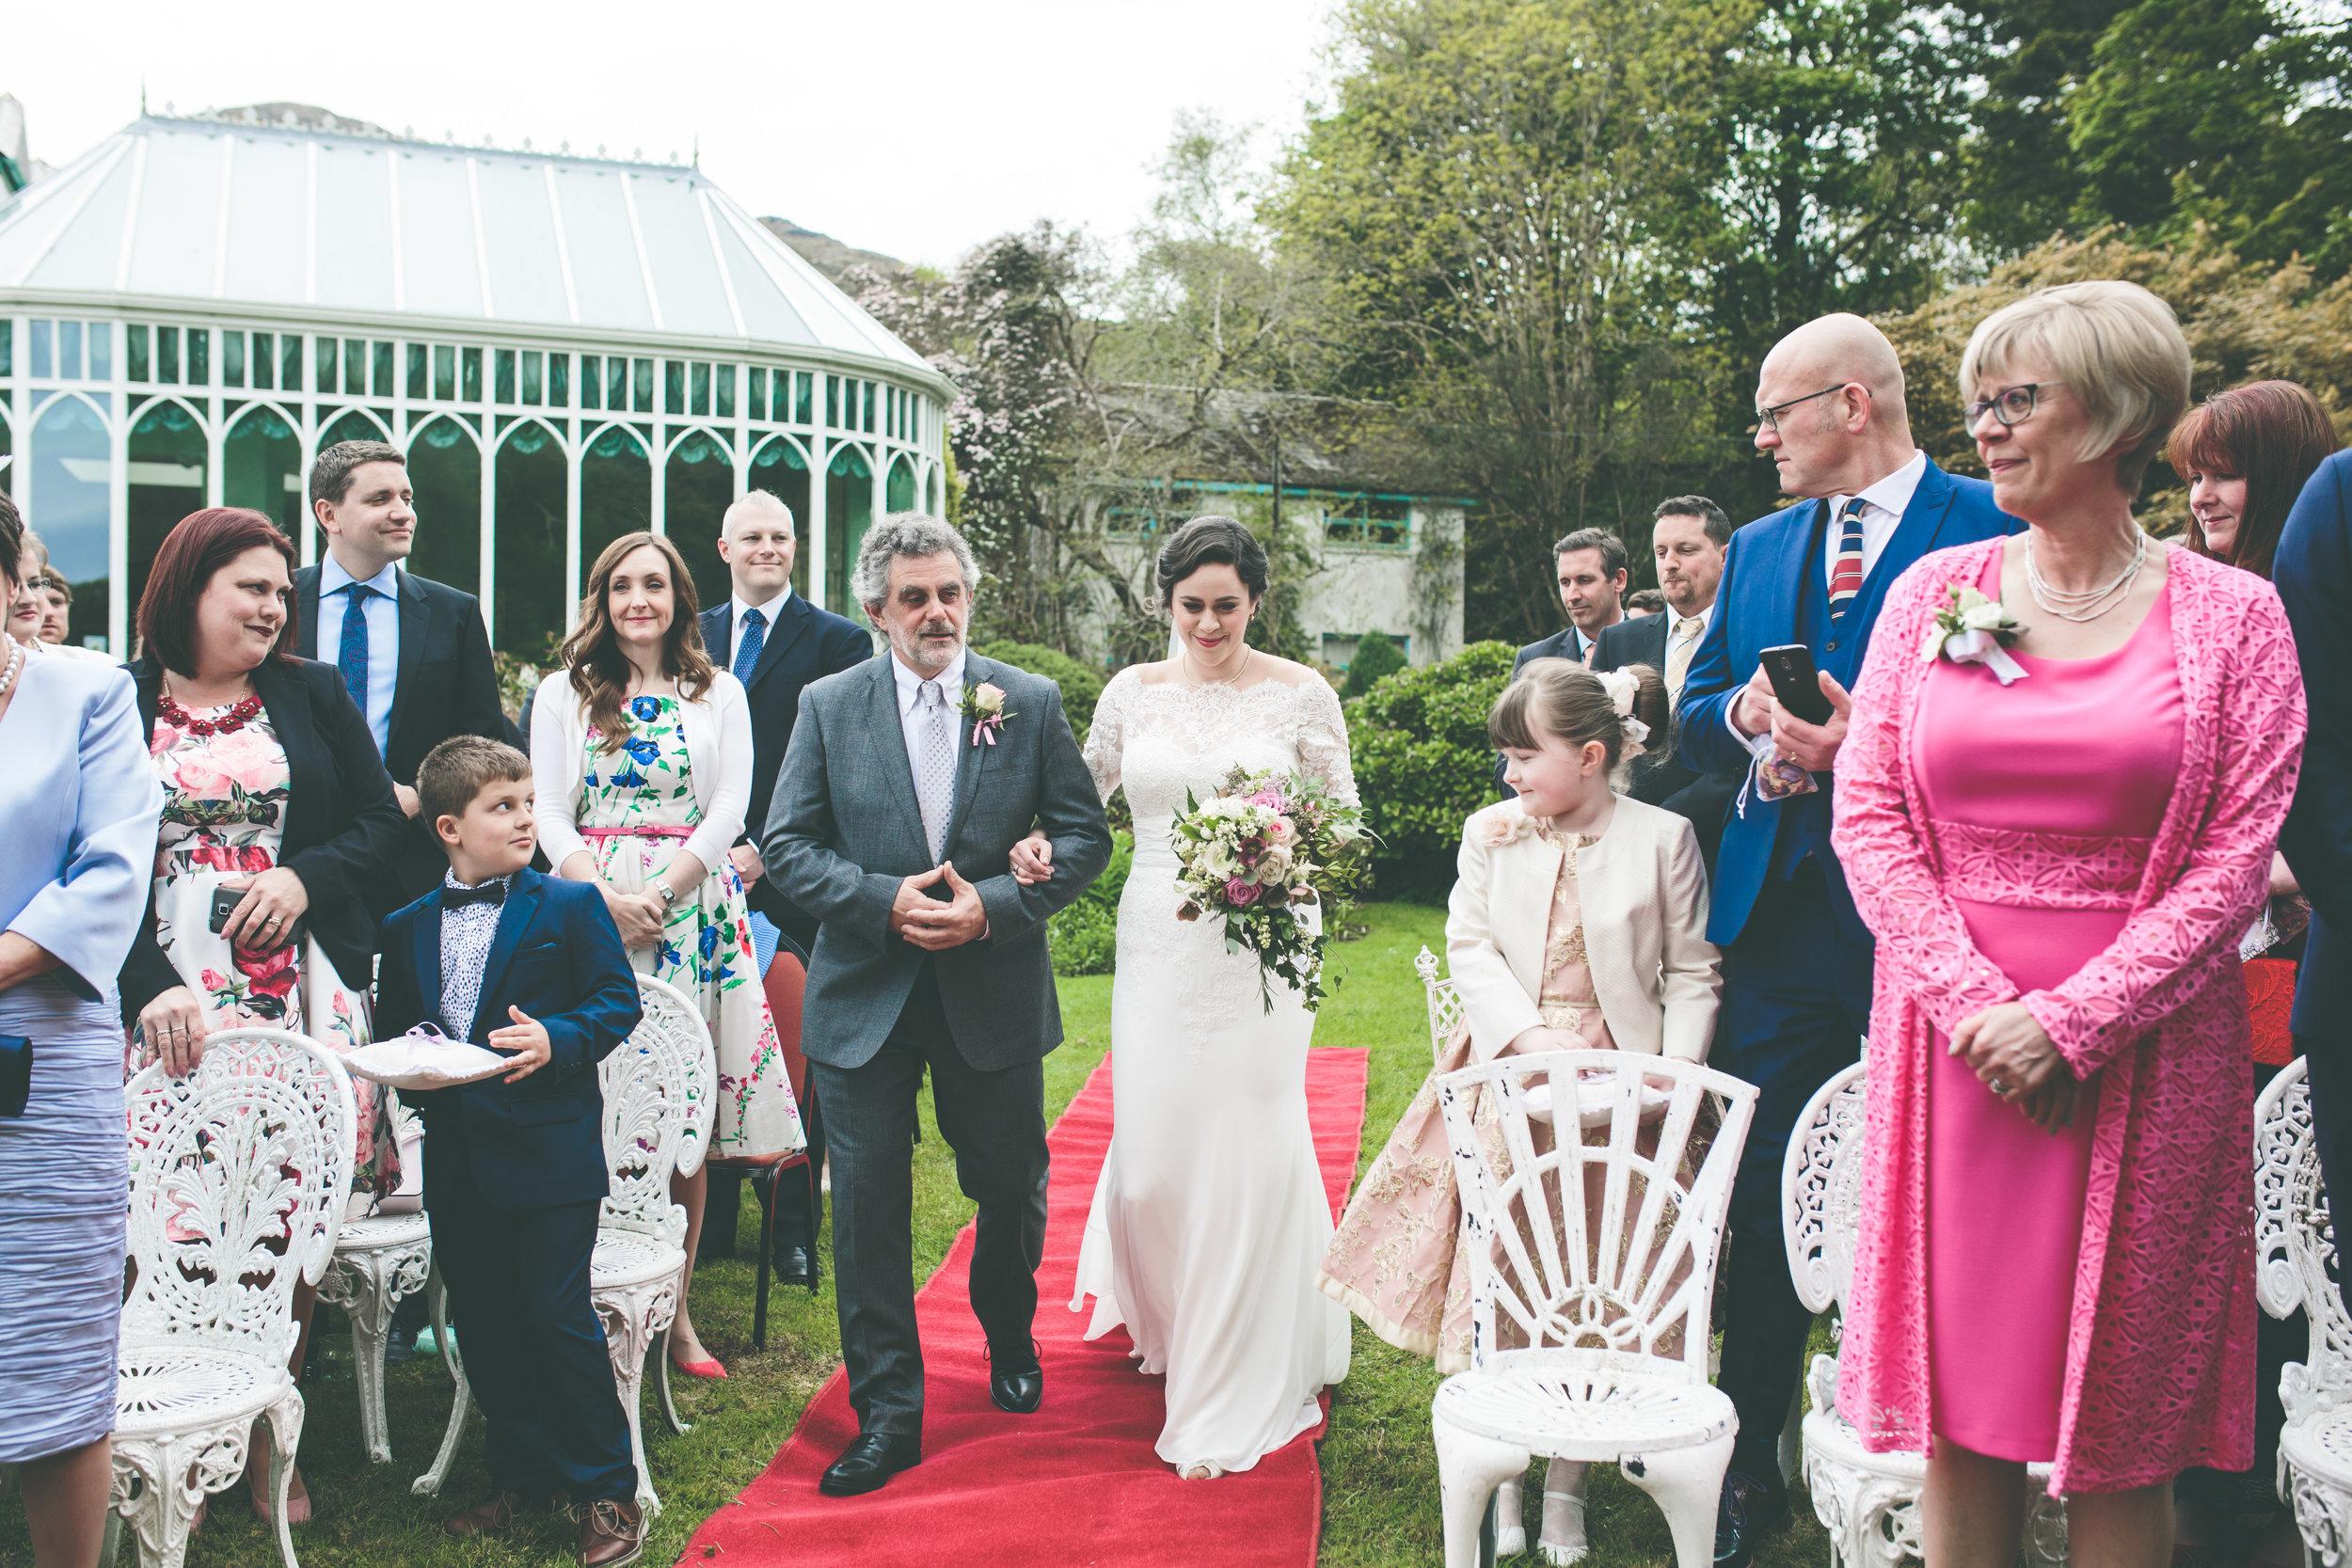 Connemara wedding photography - Walk down the aisle